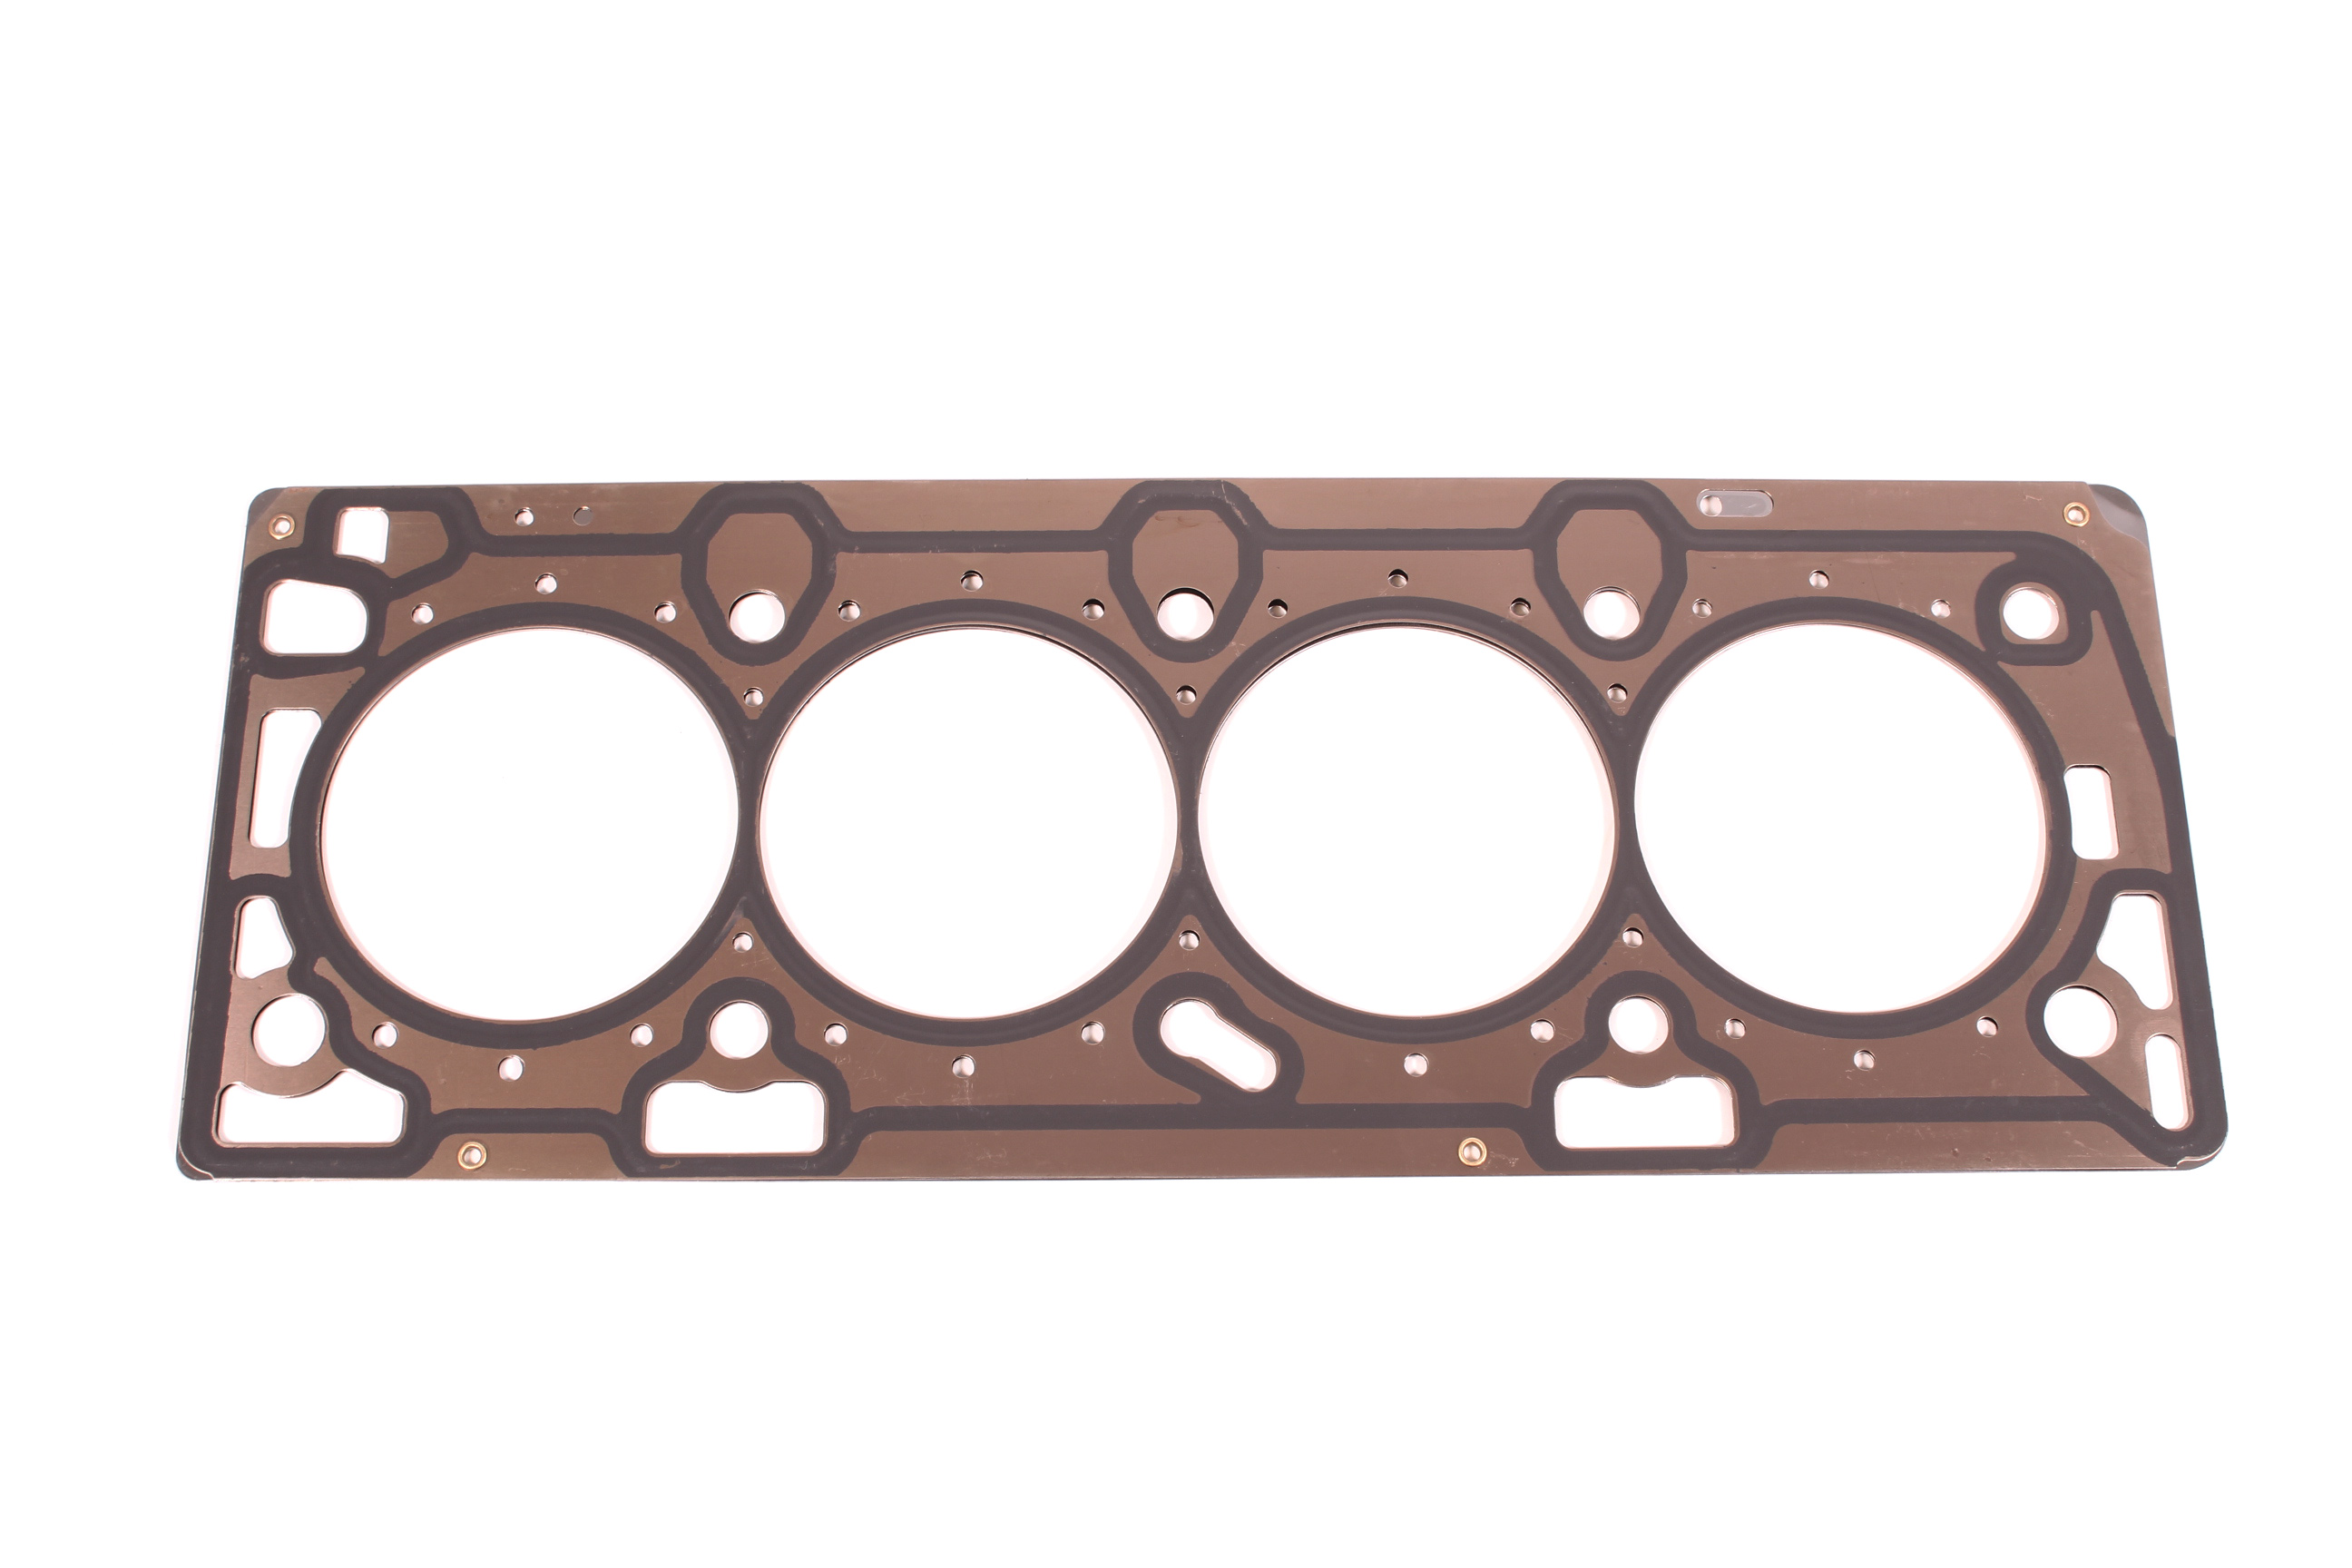 Zylinderkopfdichtung ZKD Alfa Romeo 159 1,8 MPI 939A4000 5607895 NEU